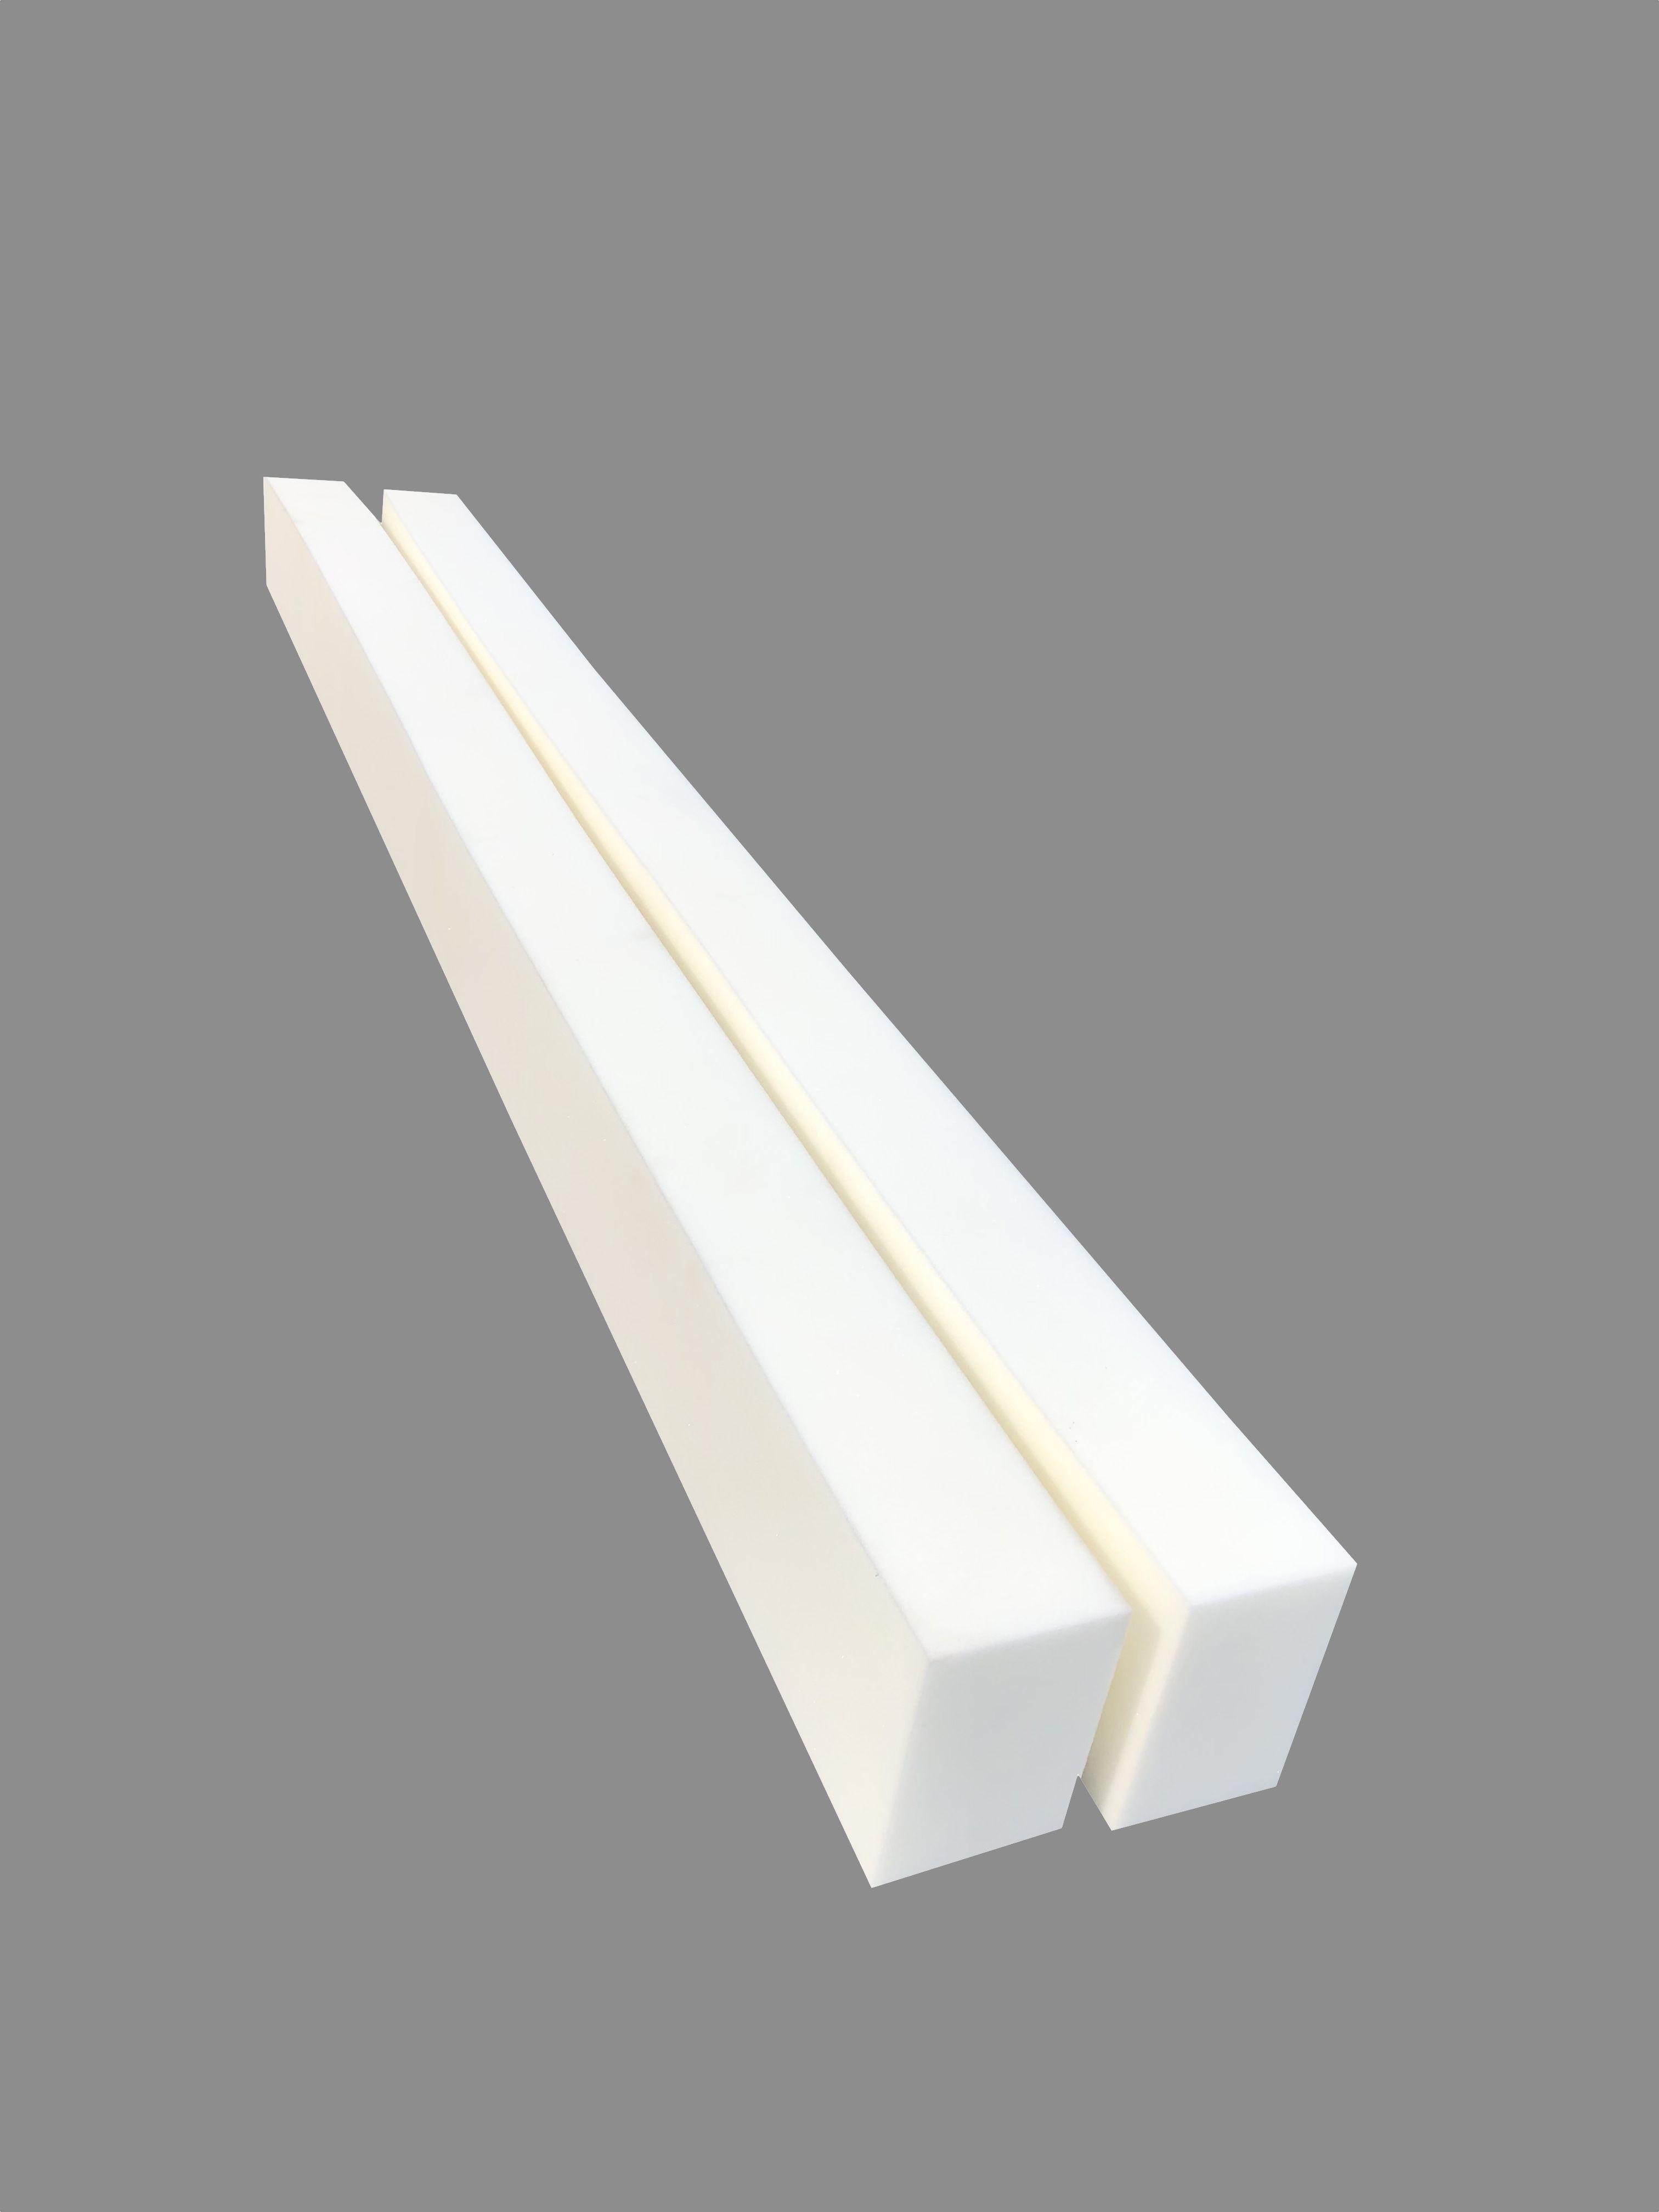 Foam Side Rails Sleep Number Bed Rails Foam